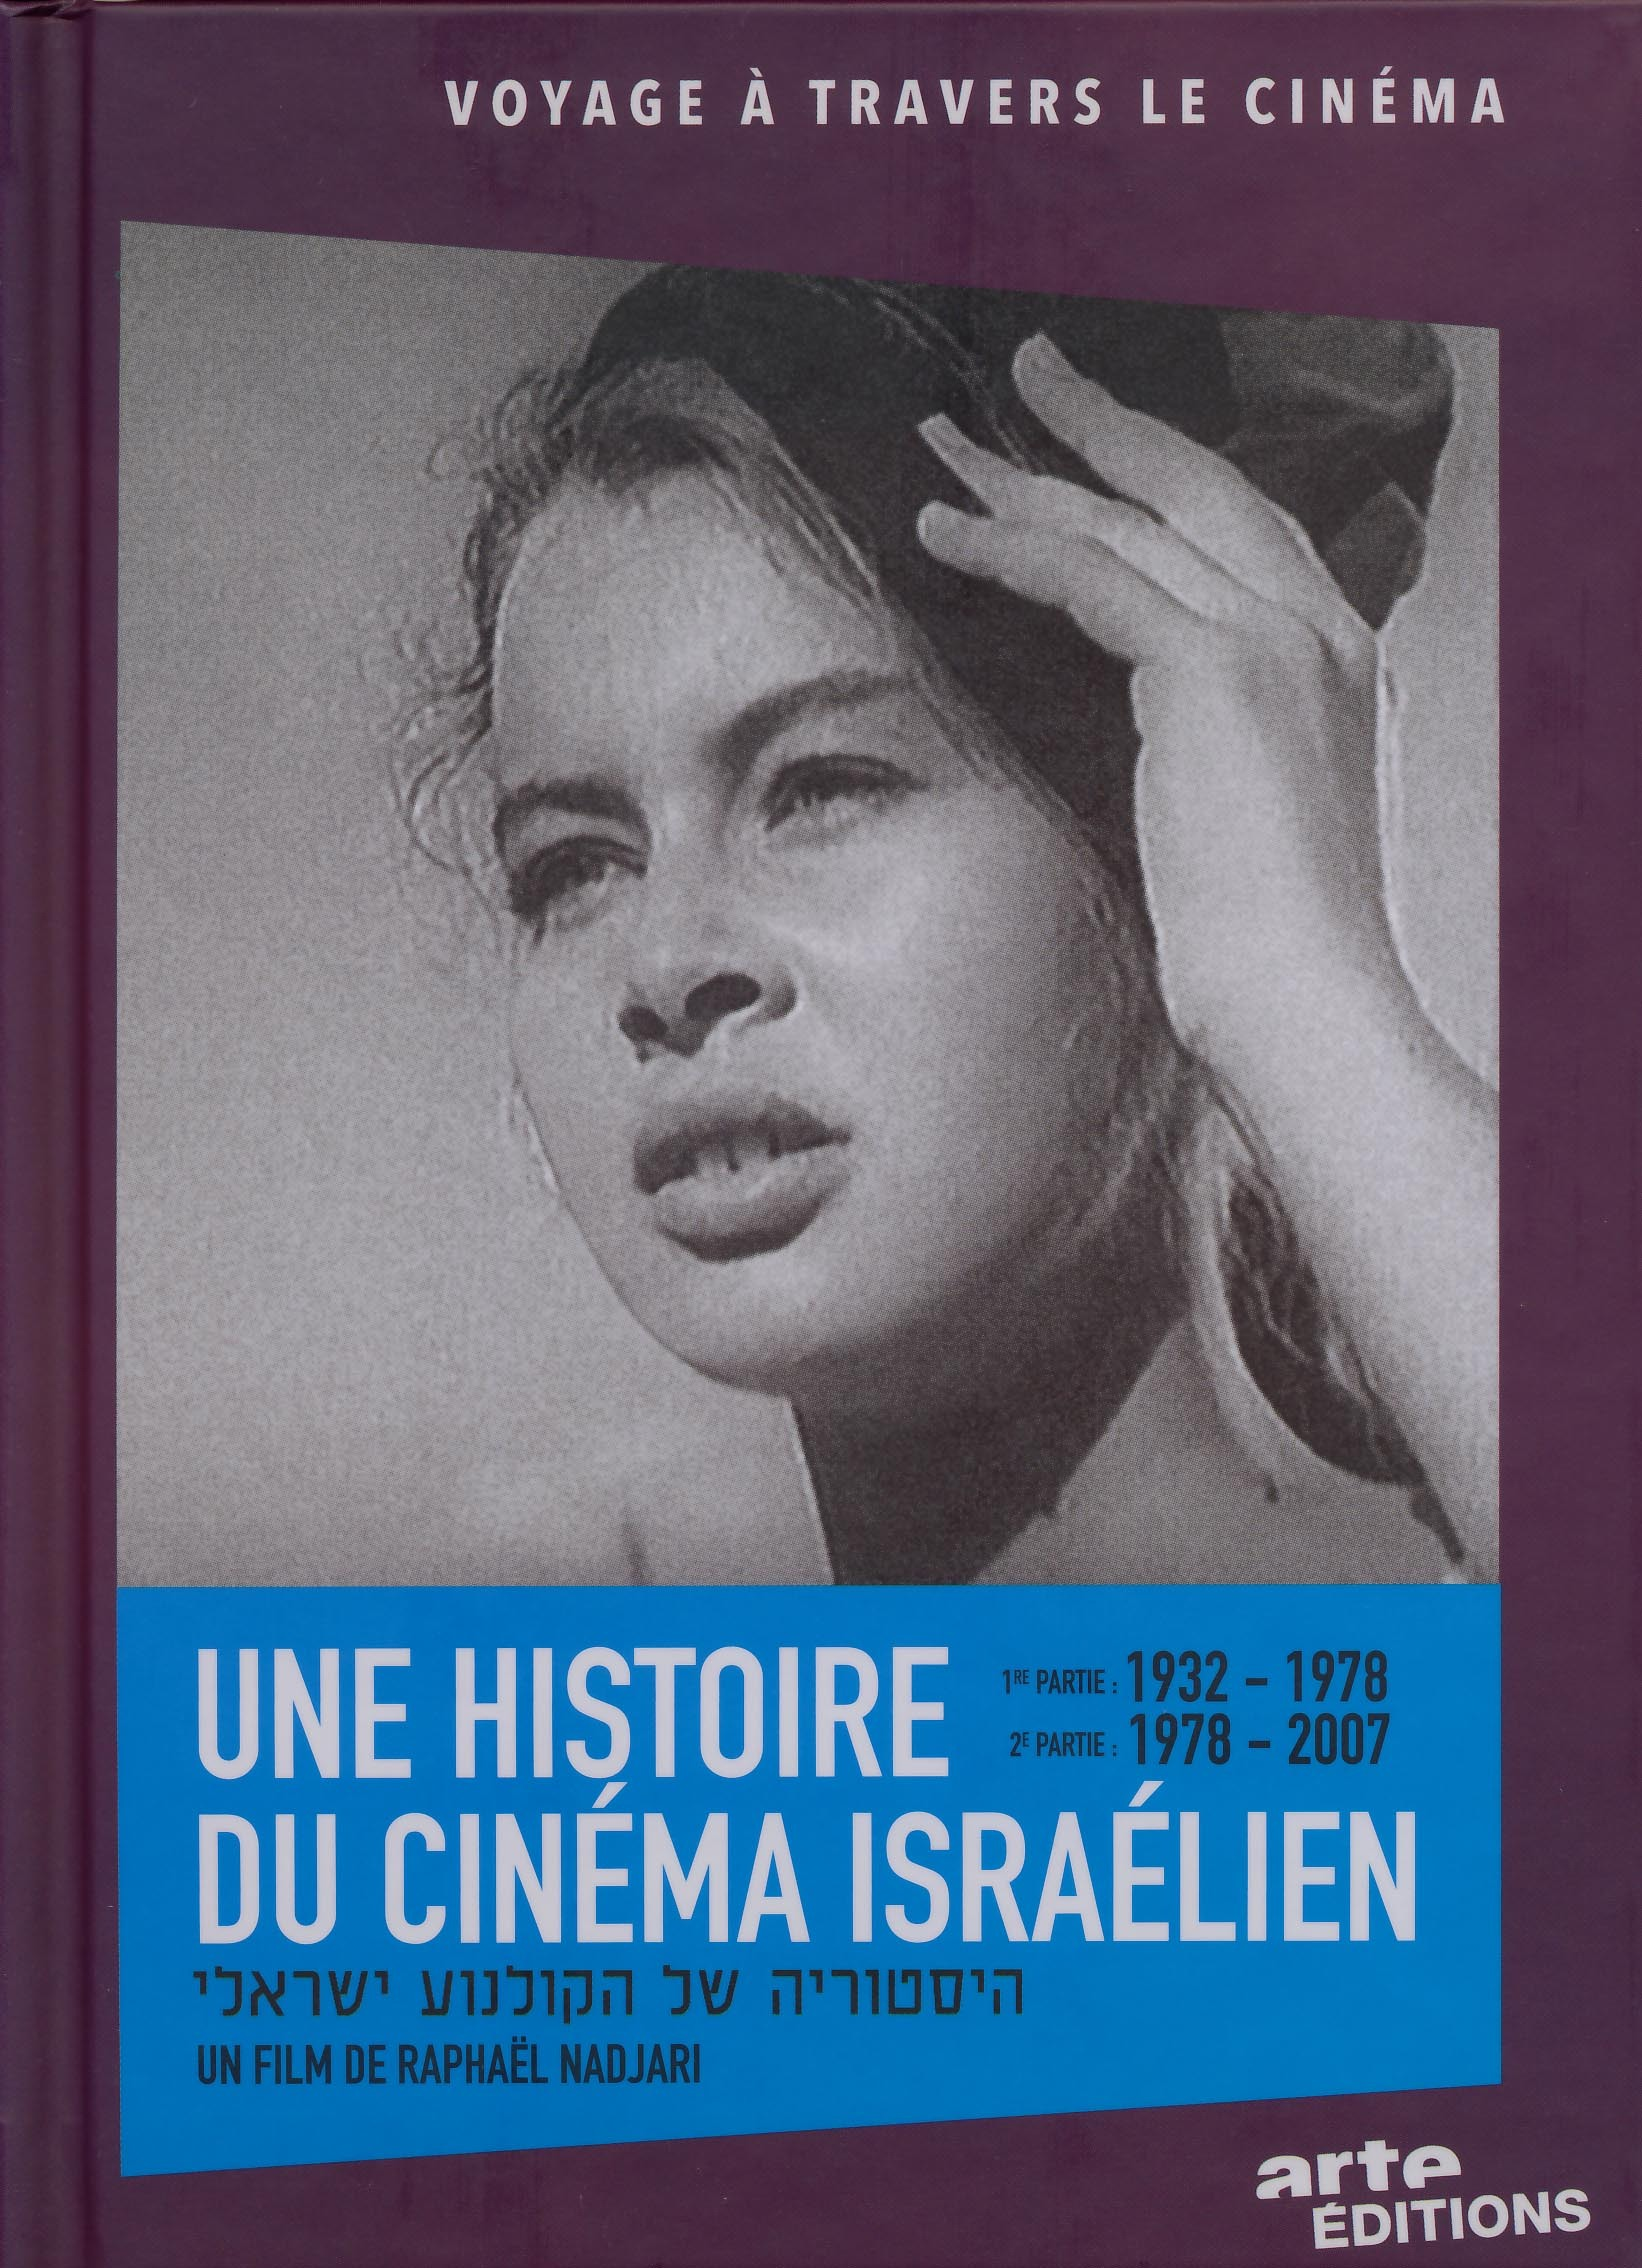 UNE HISTOIRE DU CINEMA..-2DVD-ISRAELIEN